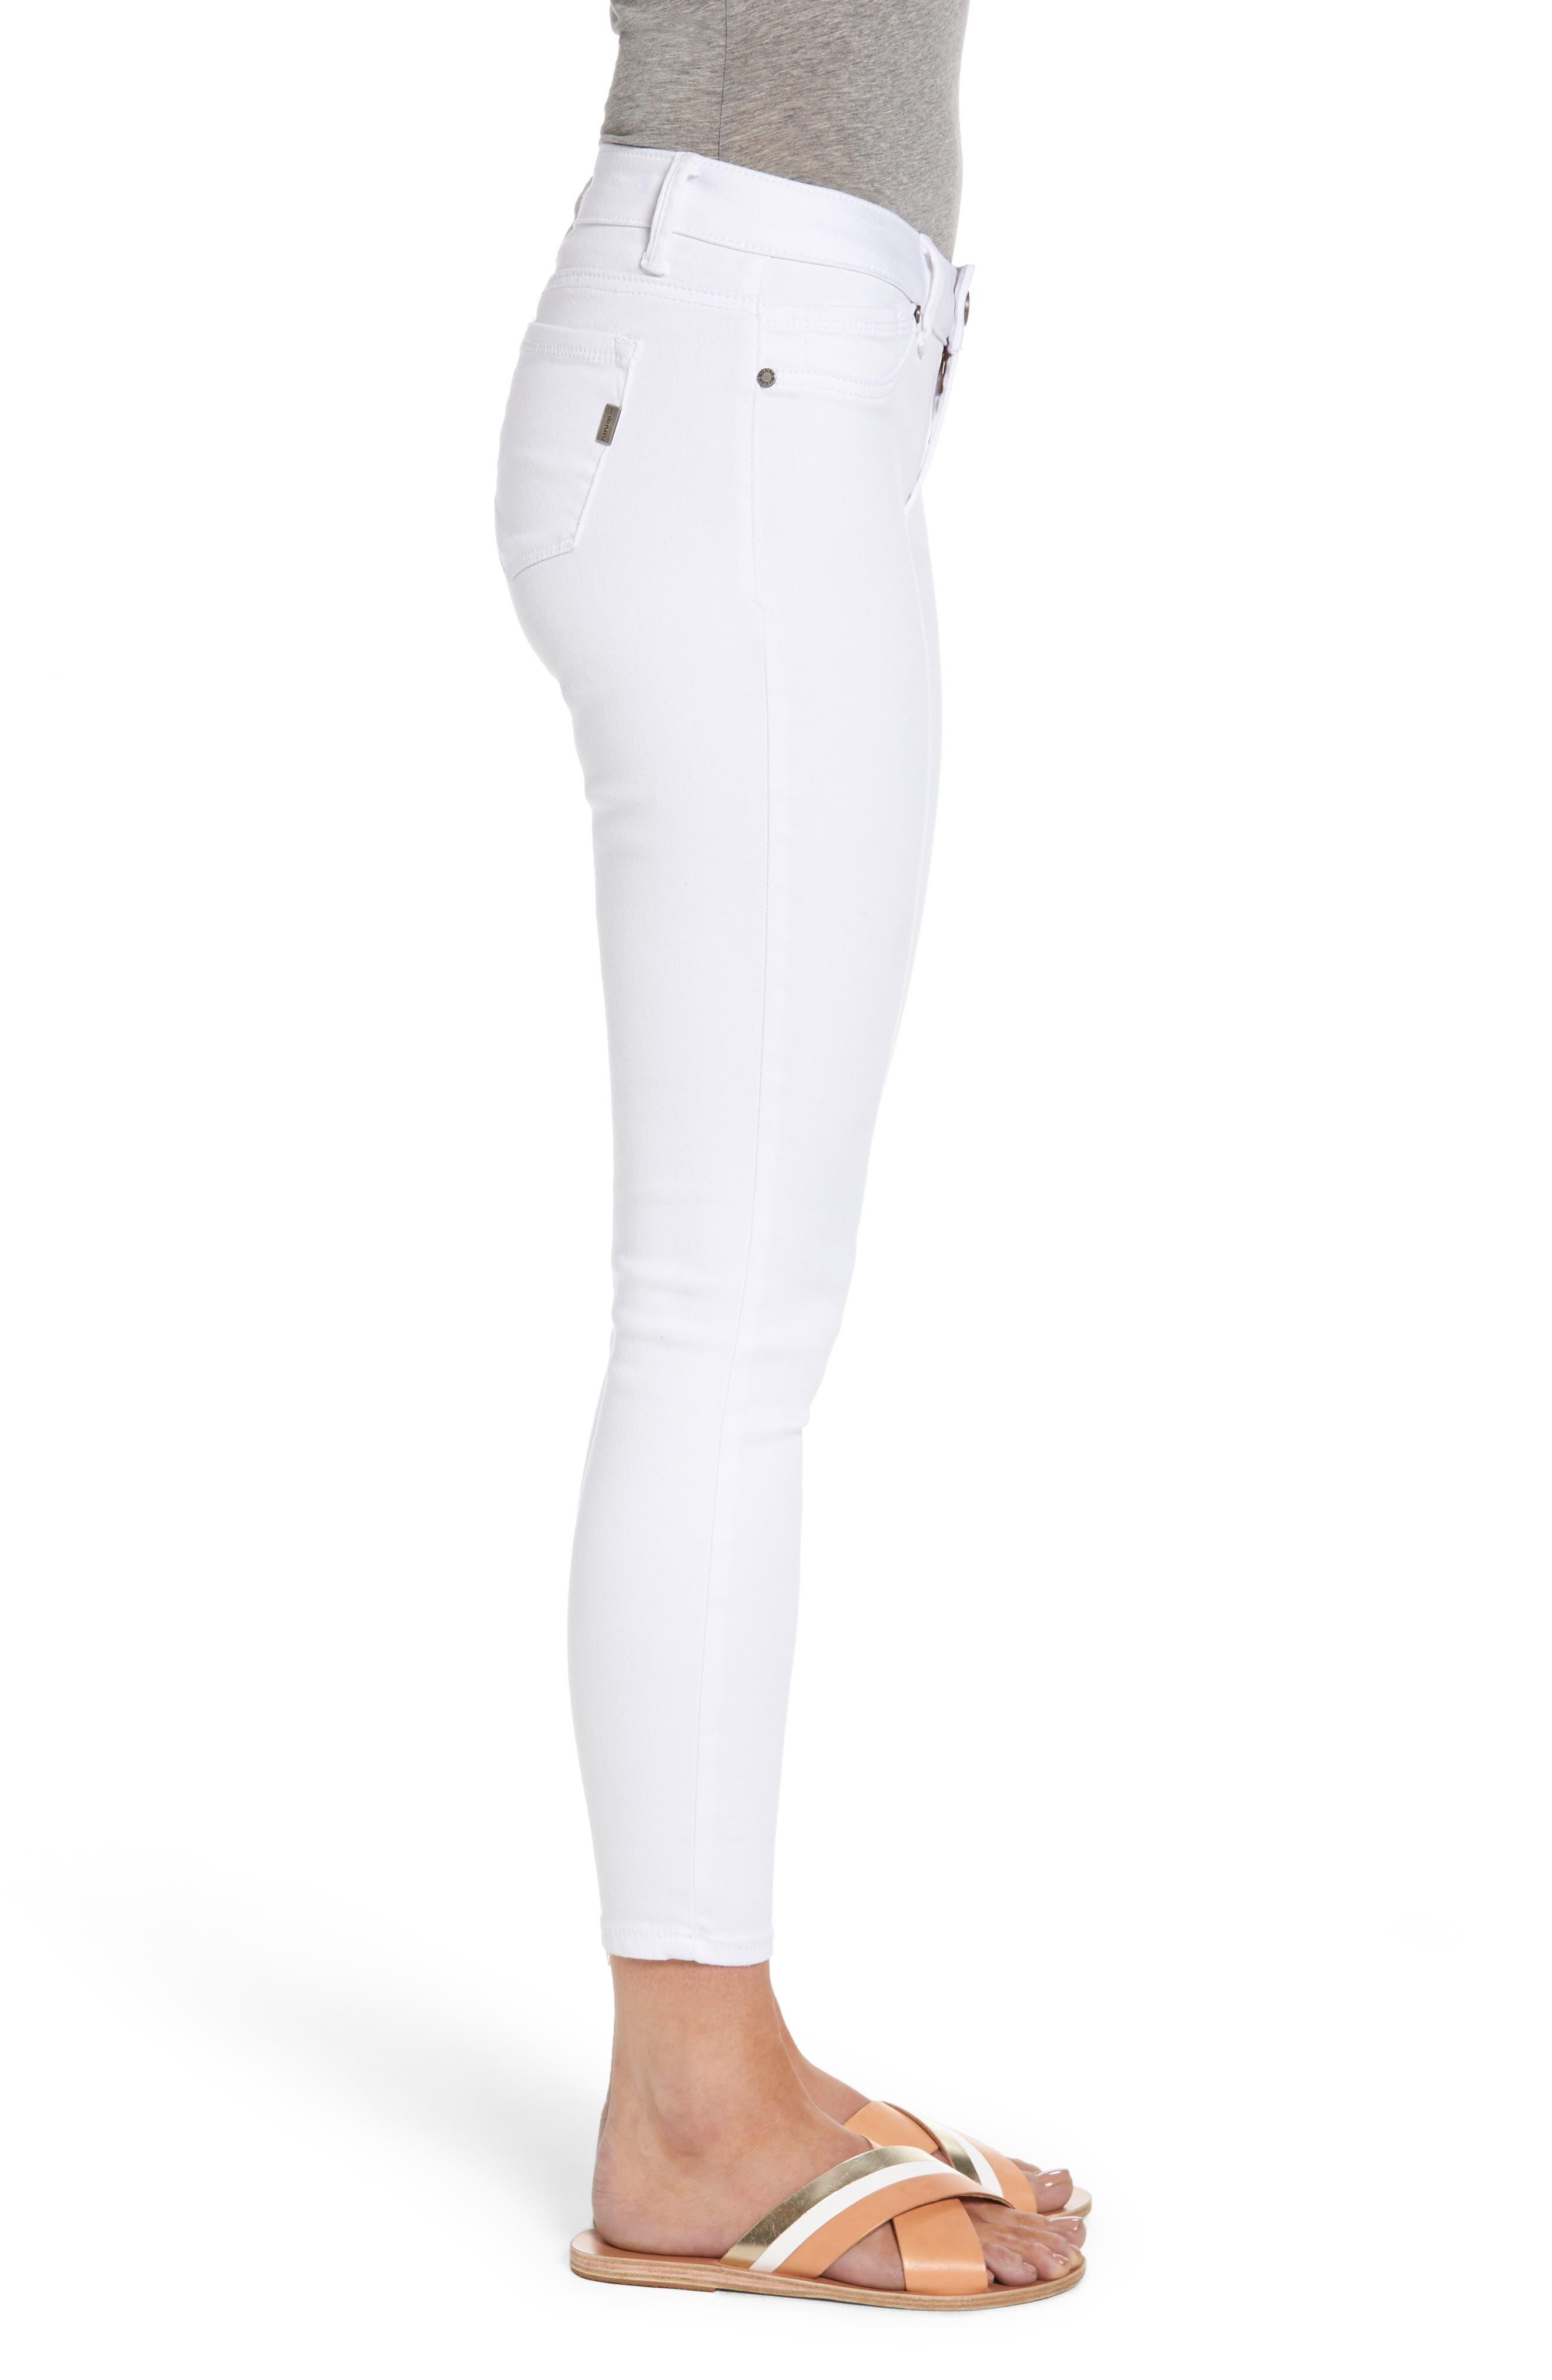 1822 Butter Skinny Jeans,                             Alternate thumbnail 3, color,